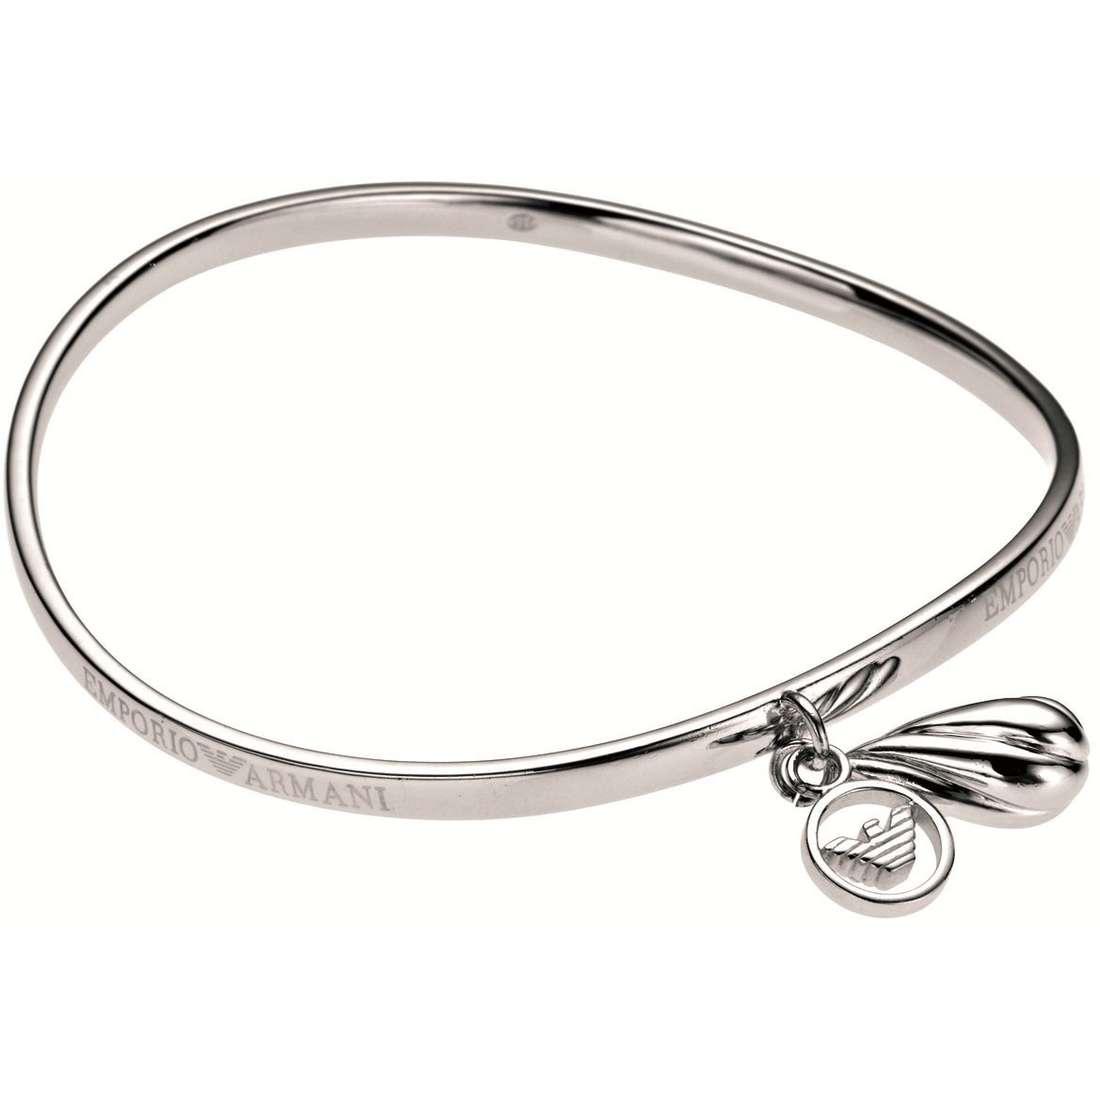 bracelet woman jewellery Emporio Armani EG278804018